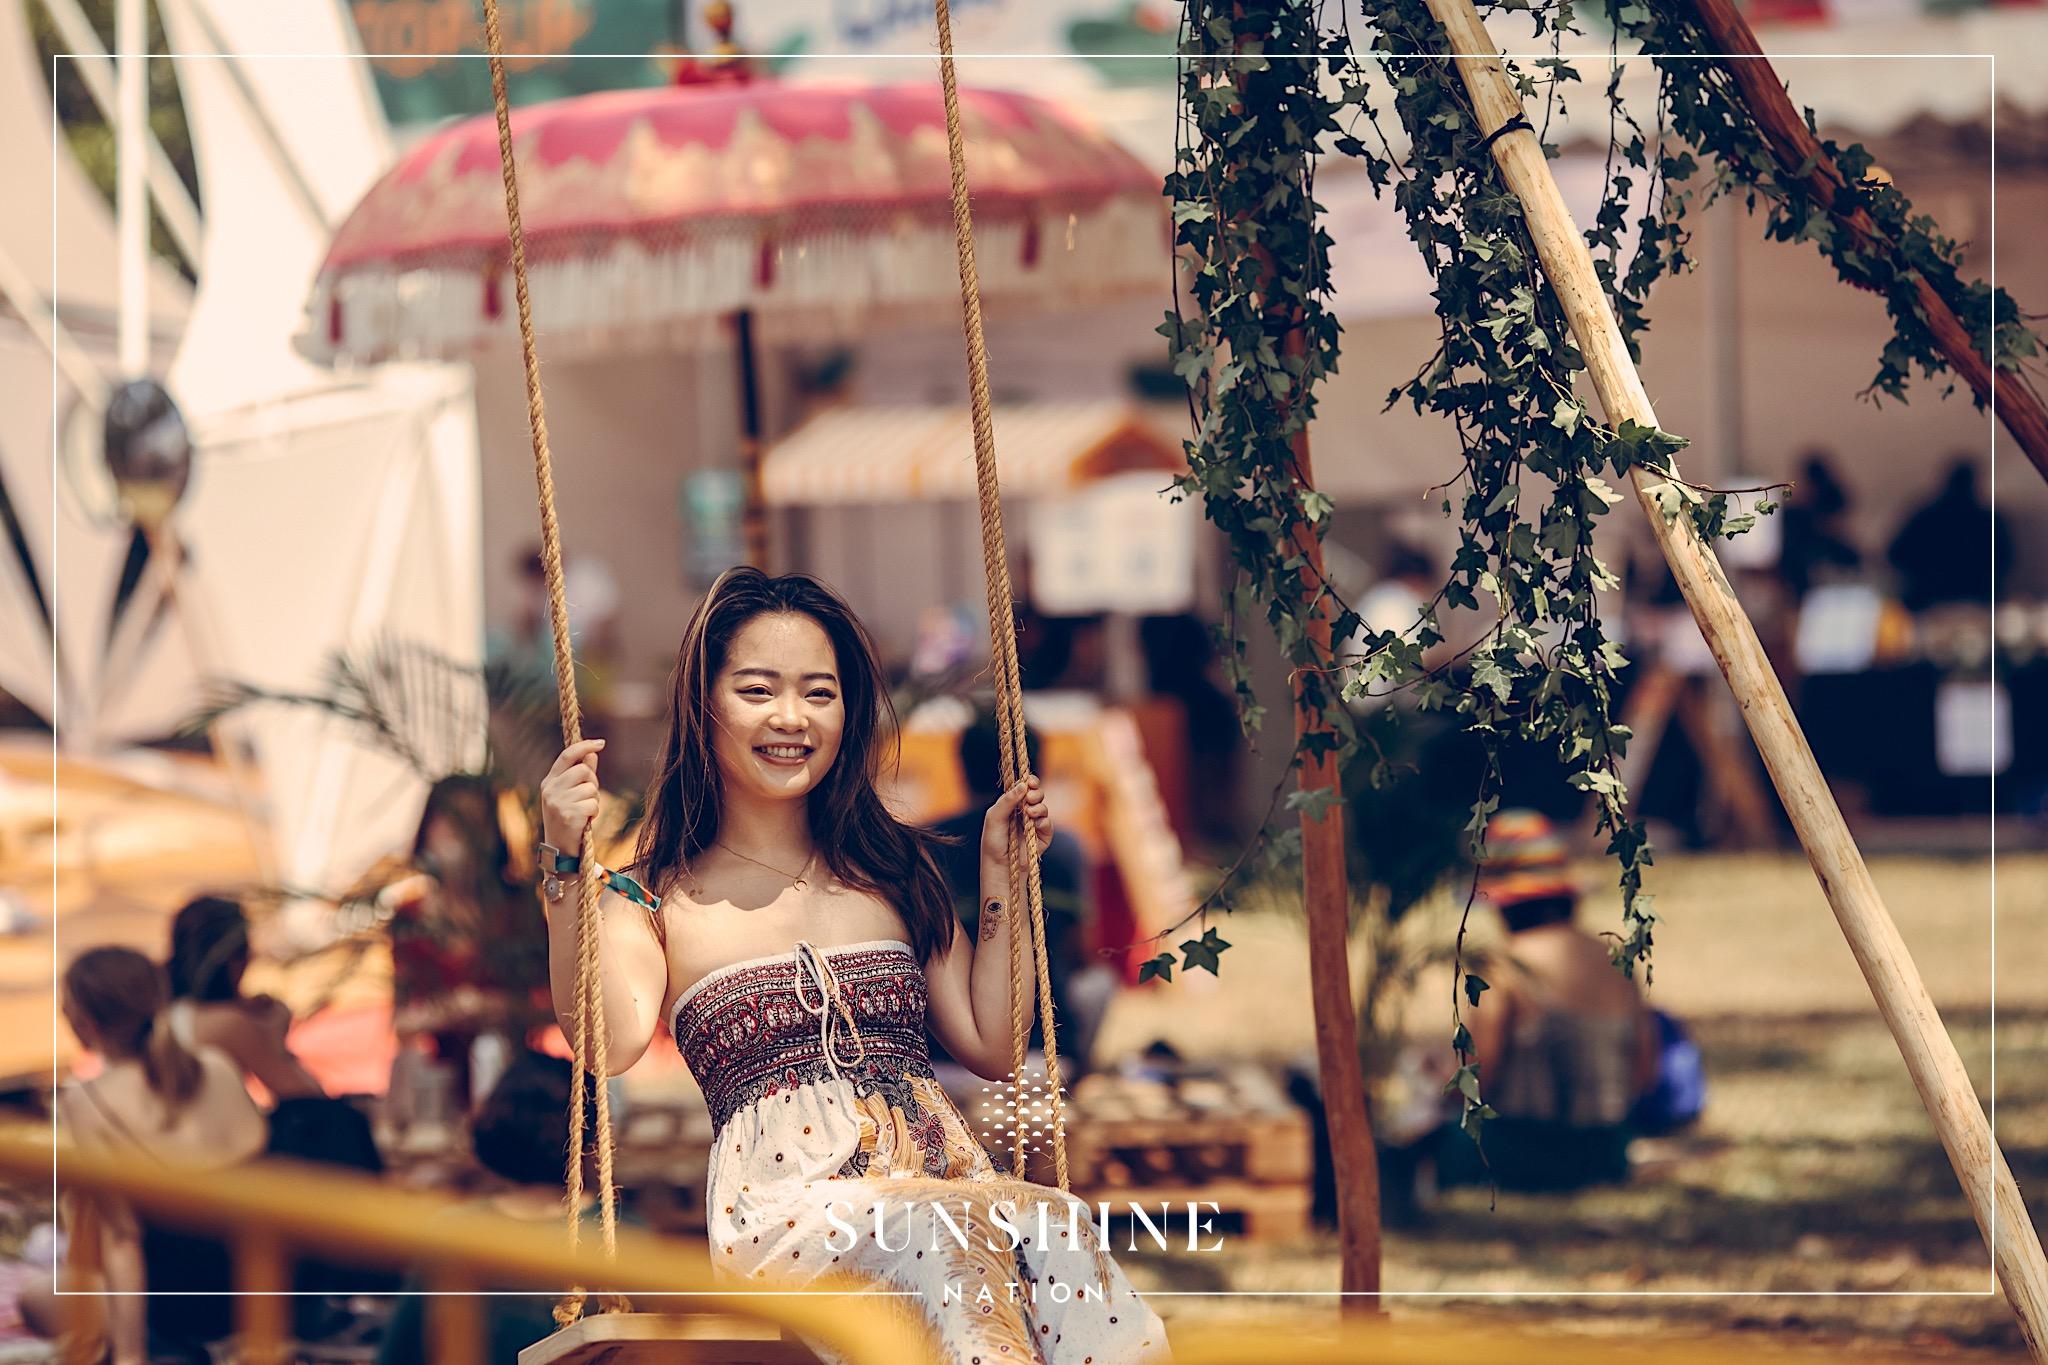 09032019_SunshineNation_Colossal023_Watermarked.jpg